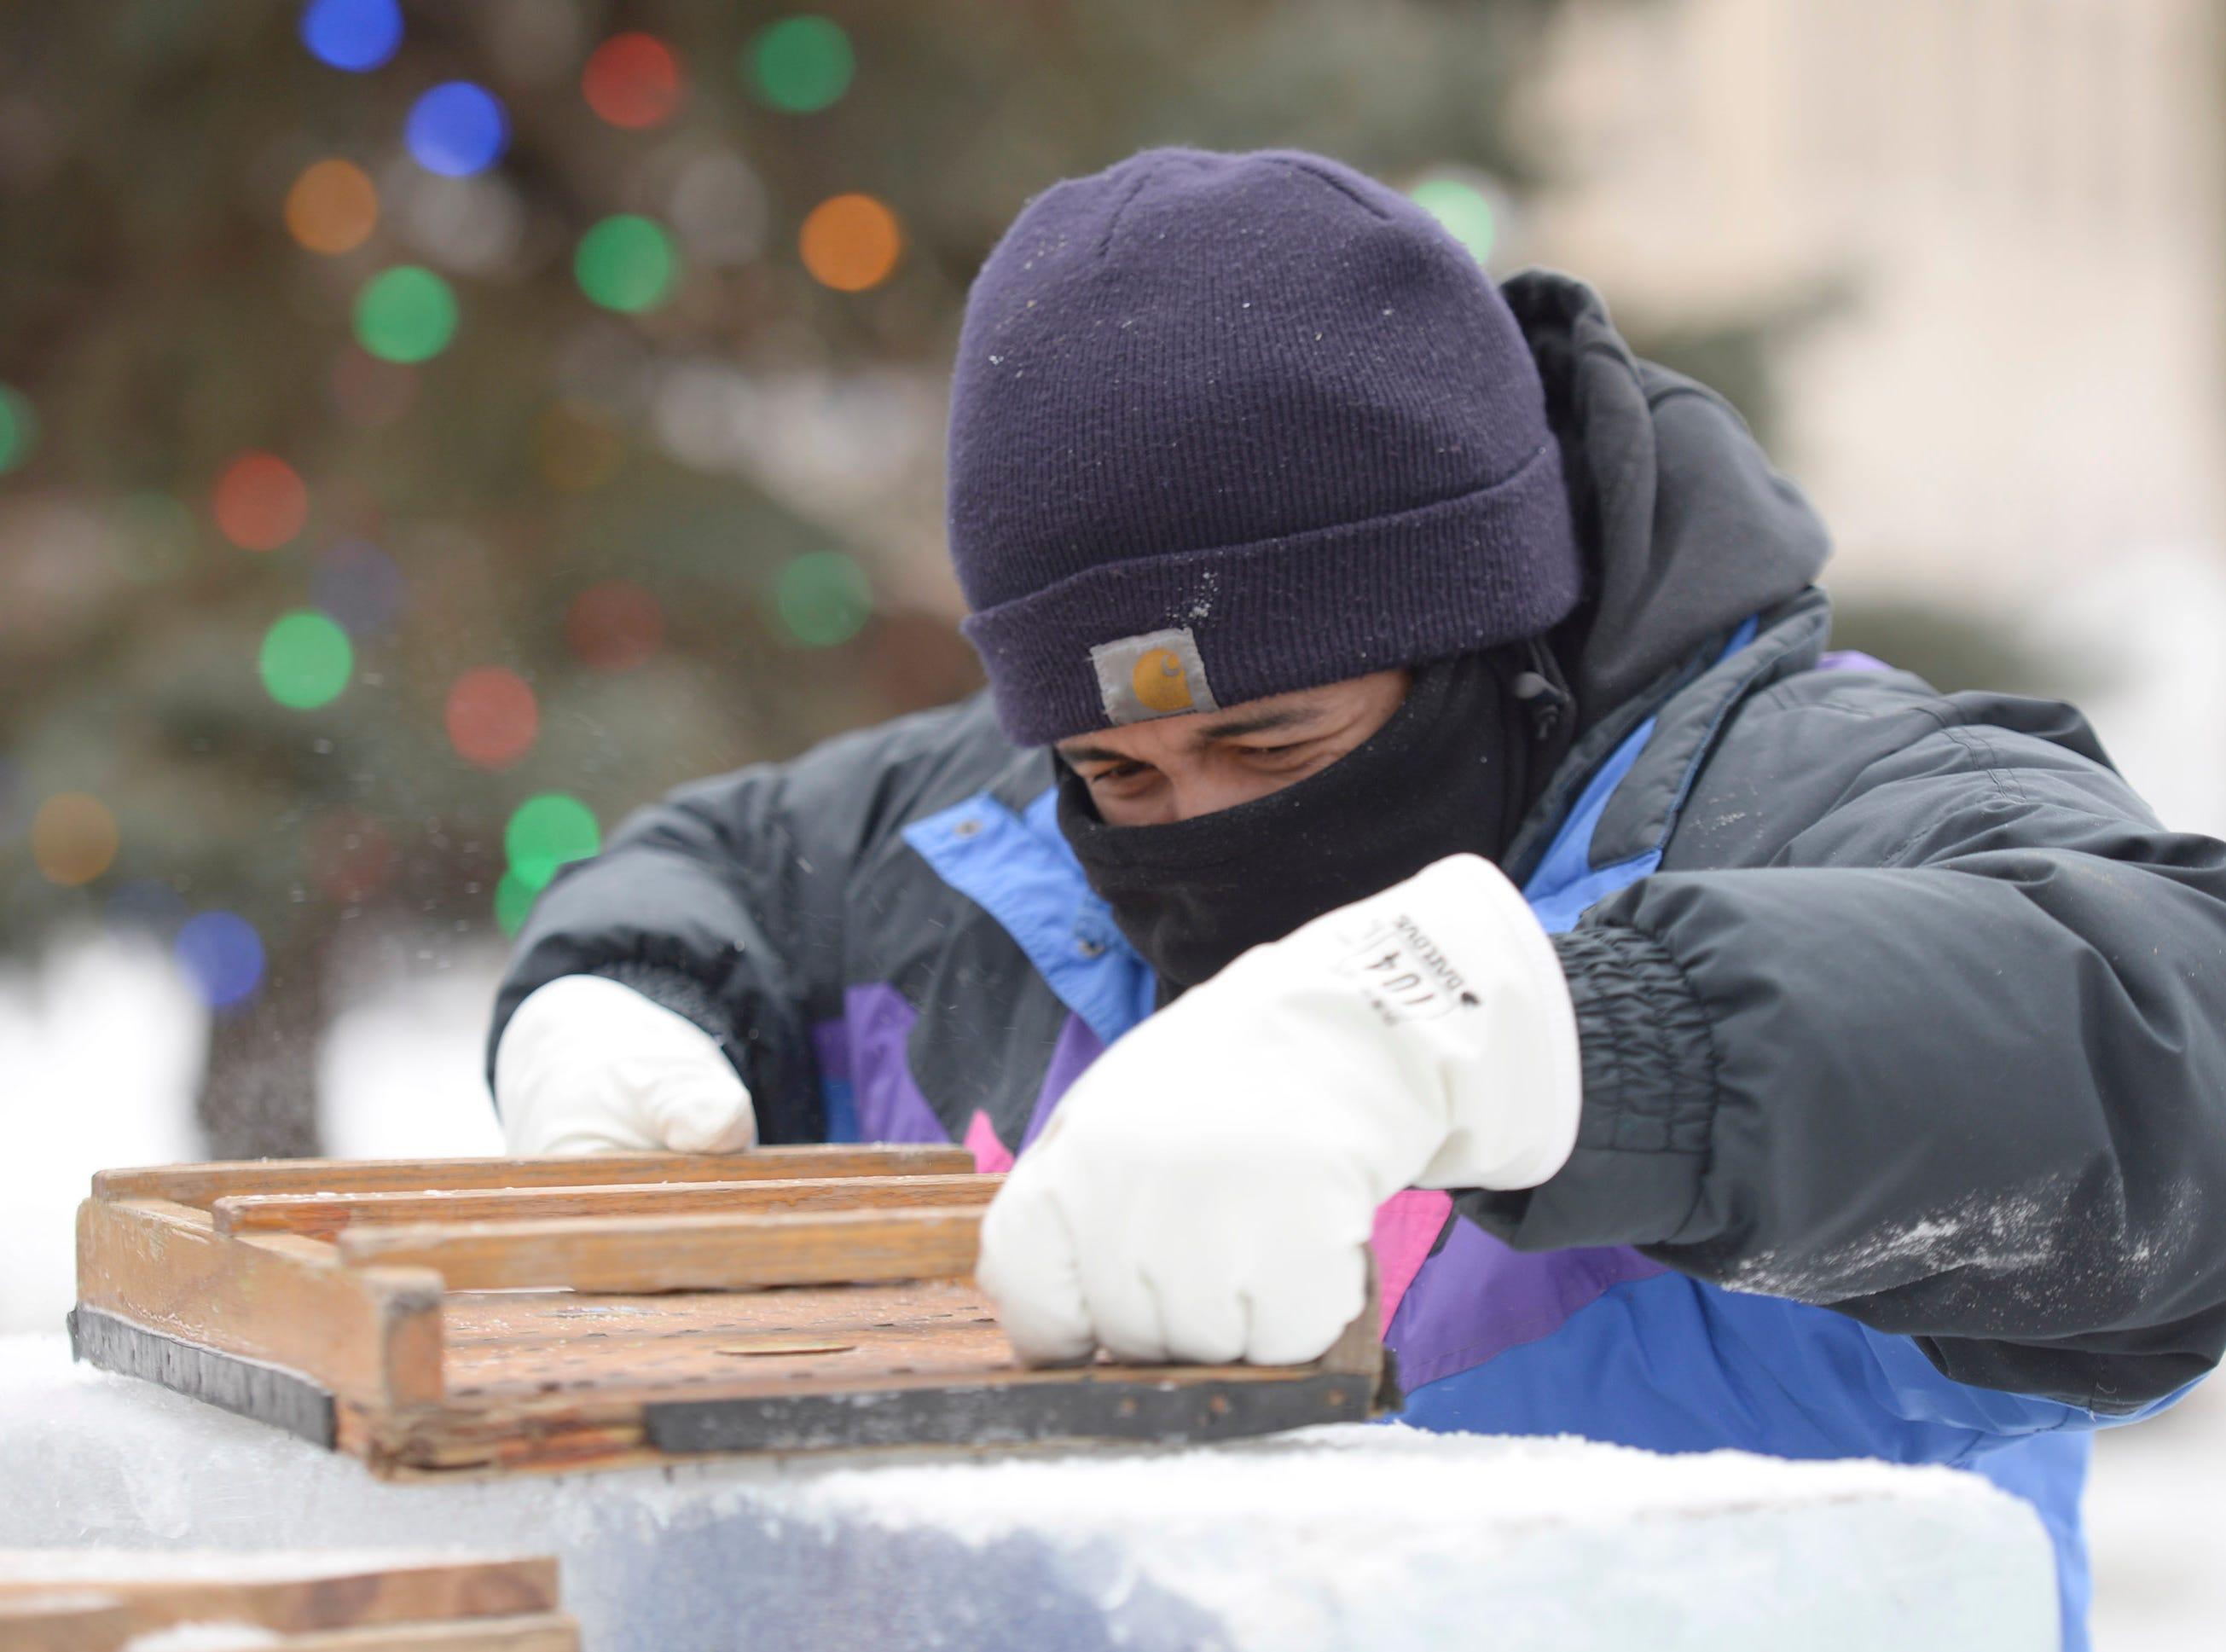 Brett Fuqua prepares blocks of ice for carving at the Plymouth Ice Festival that runs Jan. 11-13.